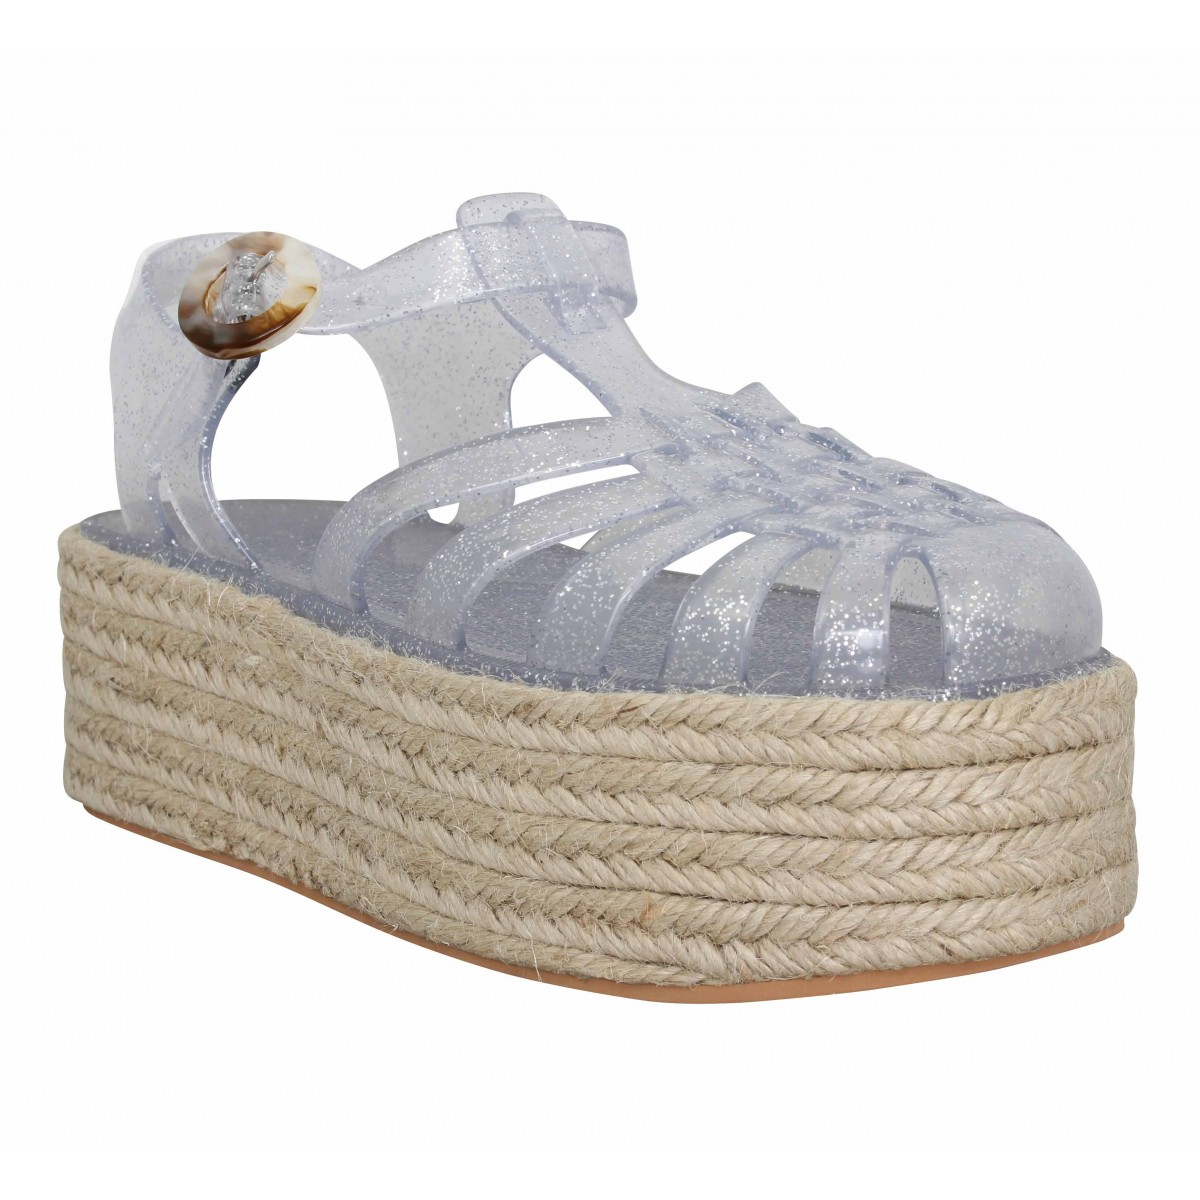 Sandales talons NO NAME X MEDUSE Calypso Meduse jelly Femme Silver